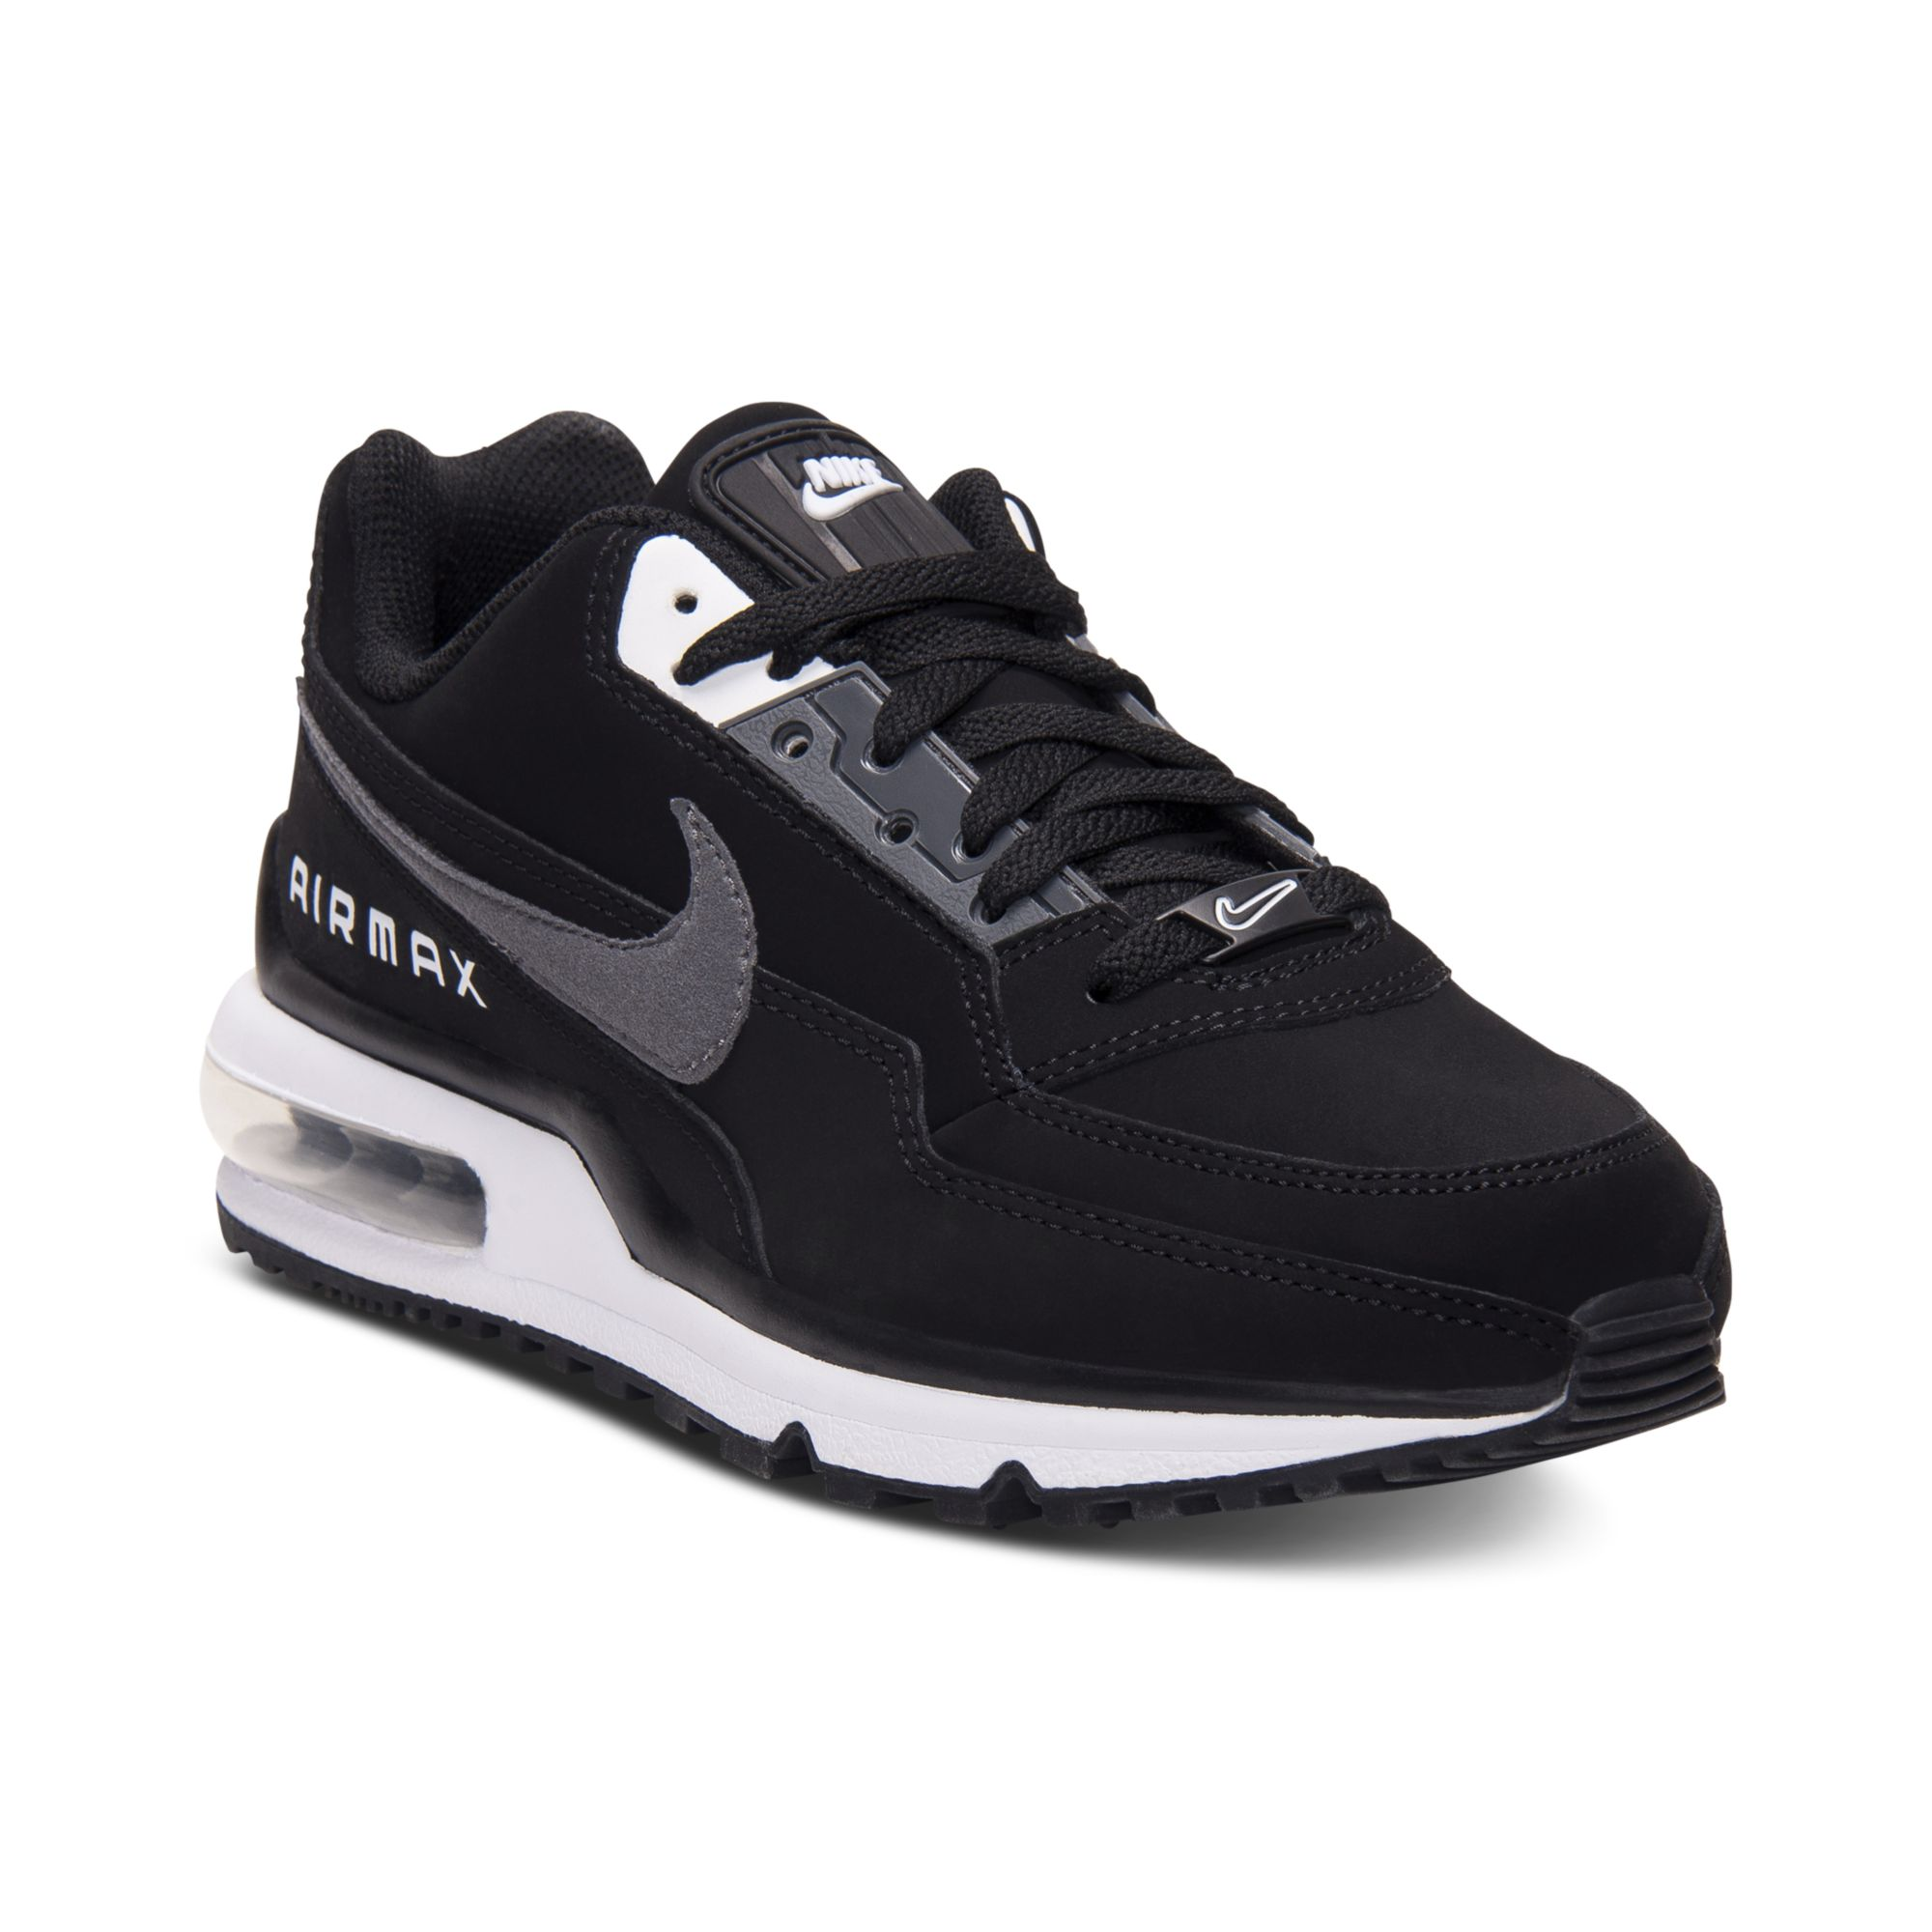 newest 3eca7 1e7f4 norway lyst nike air max ltd running sneakers in black for men ecf36 75b43